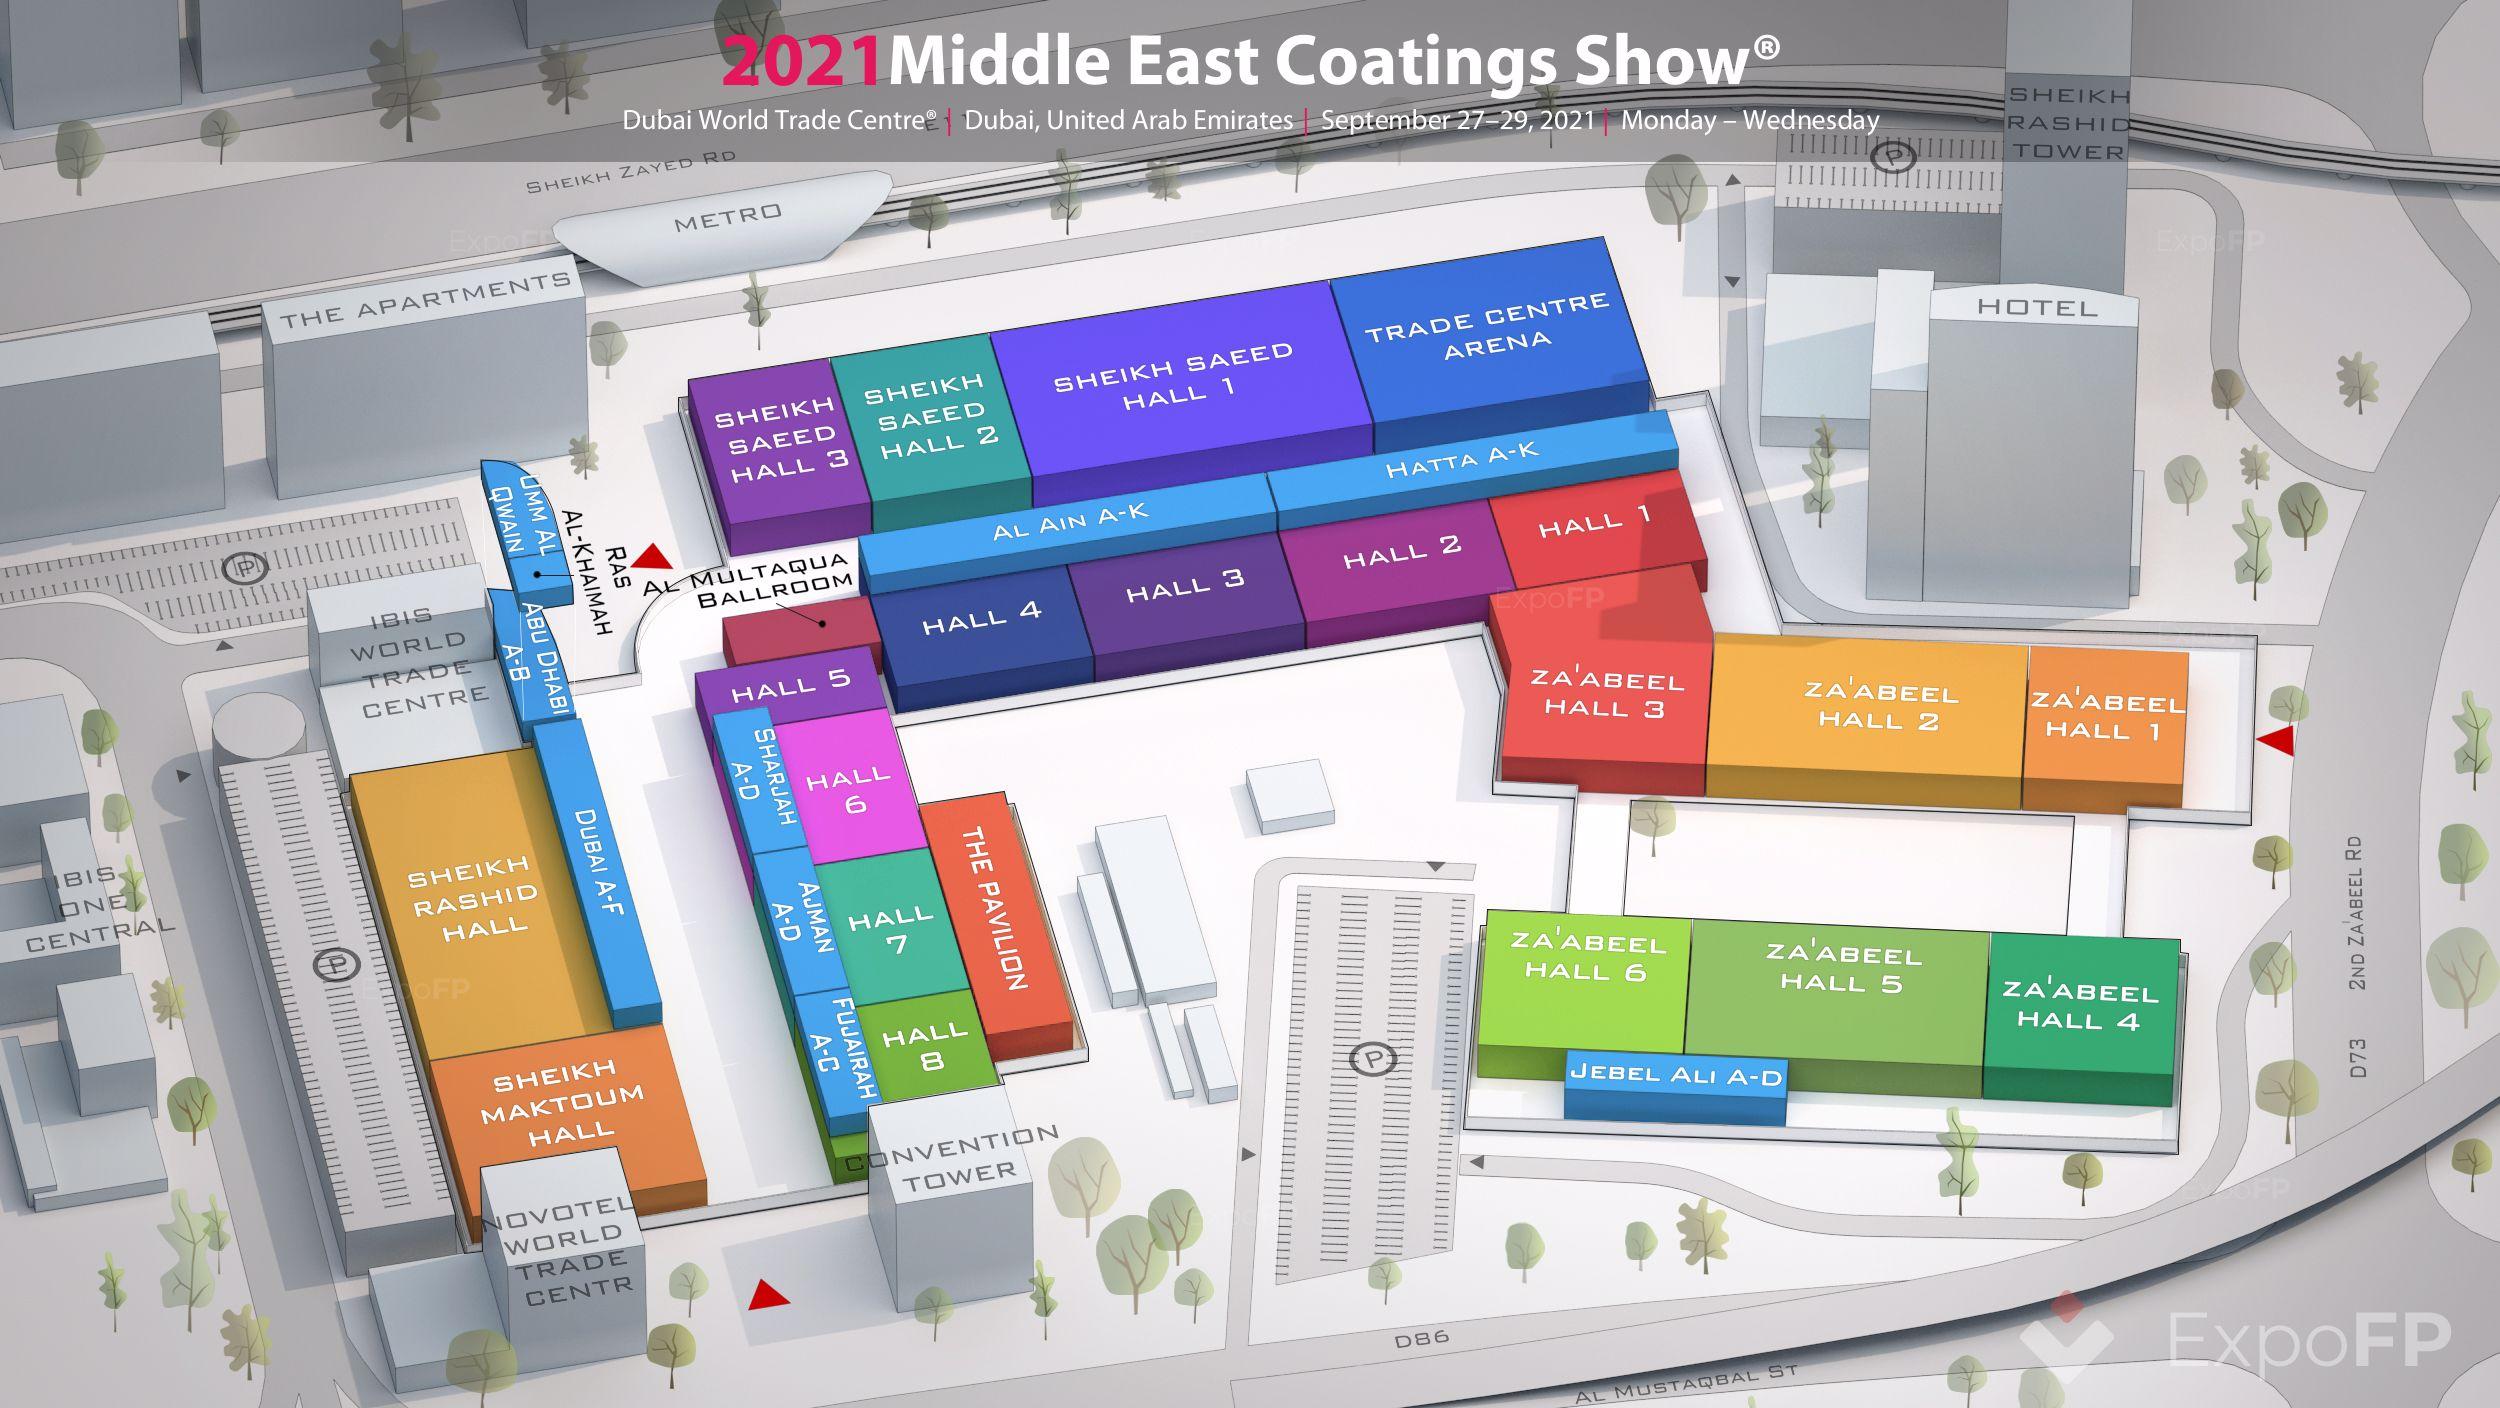 Middle East Coatings Show 2021 3D floor plan